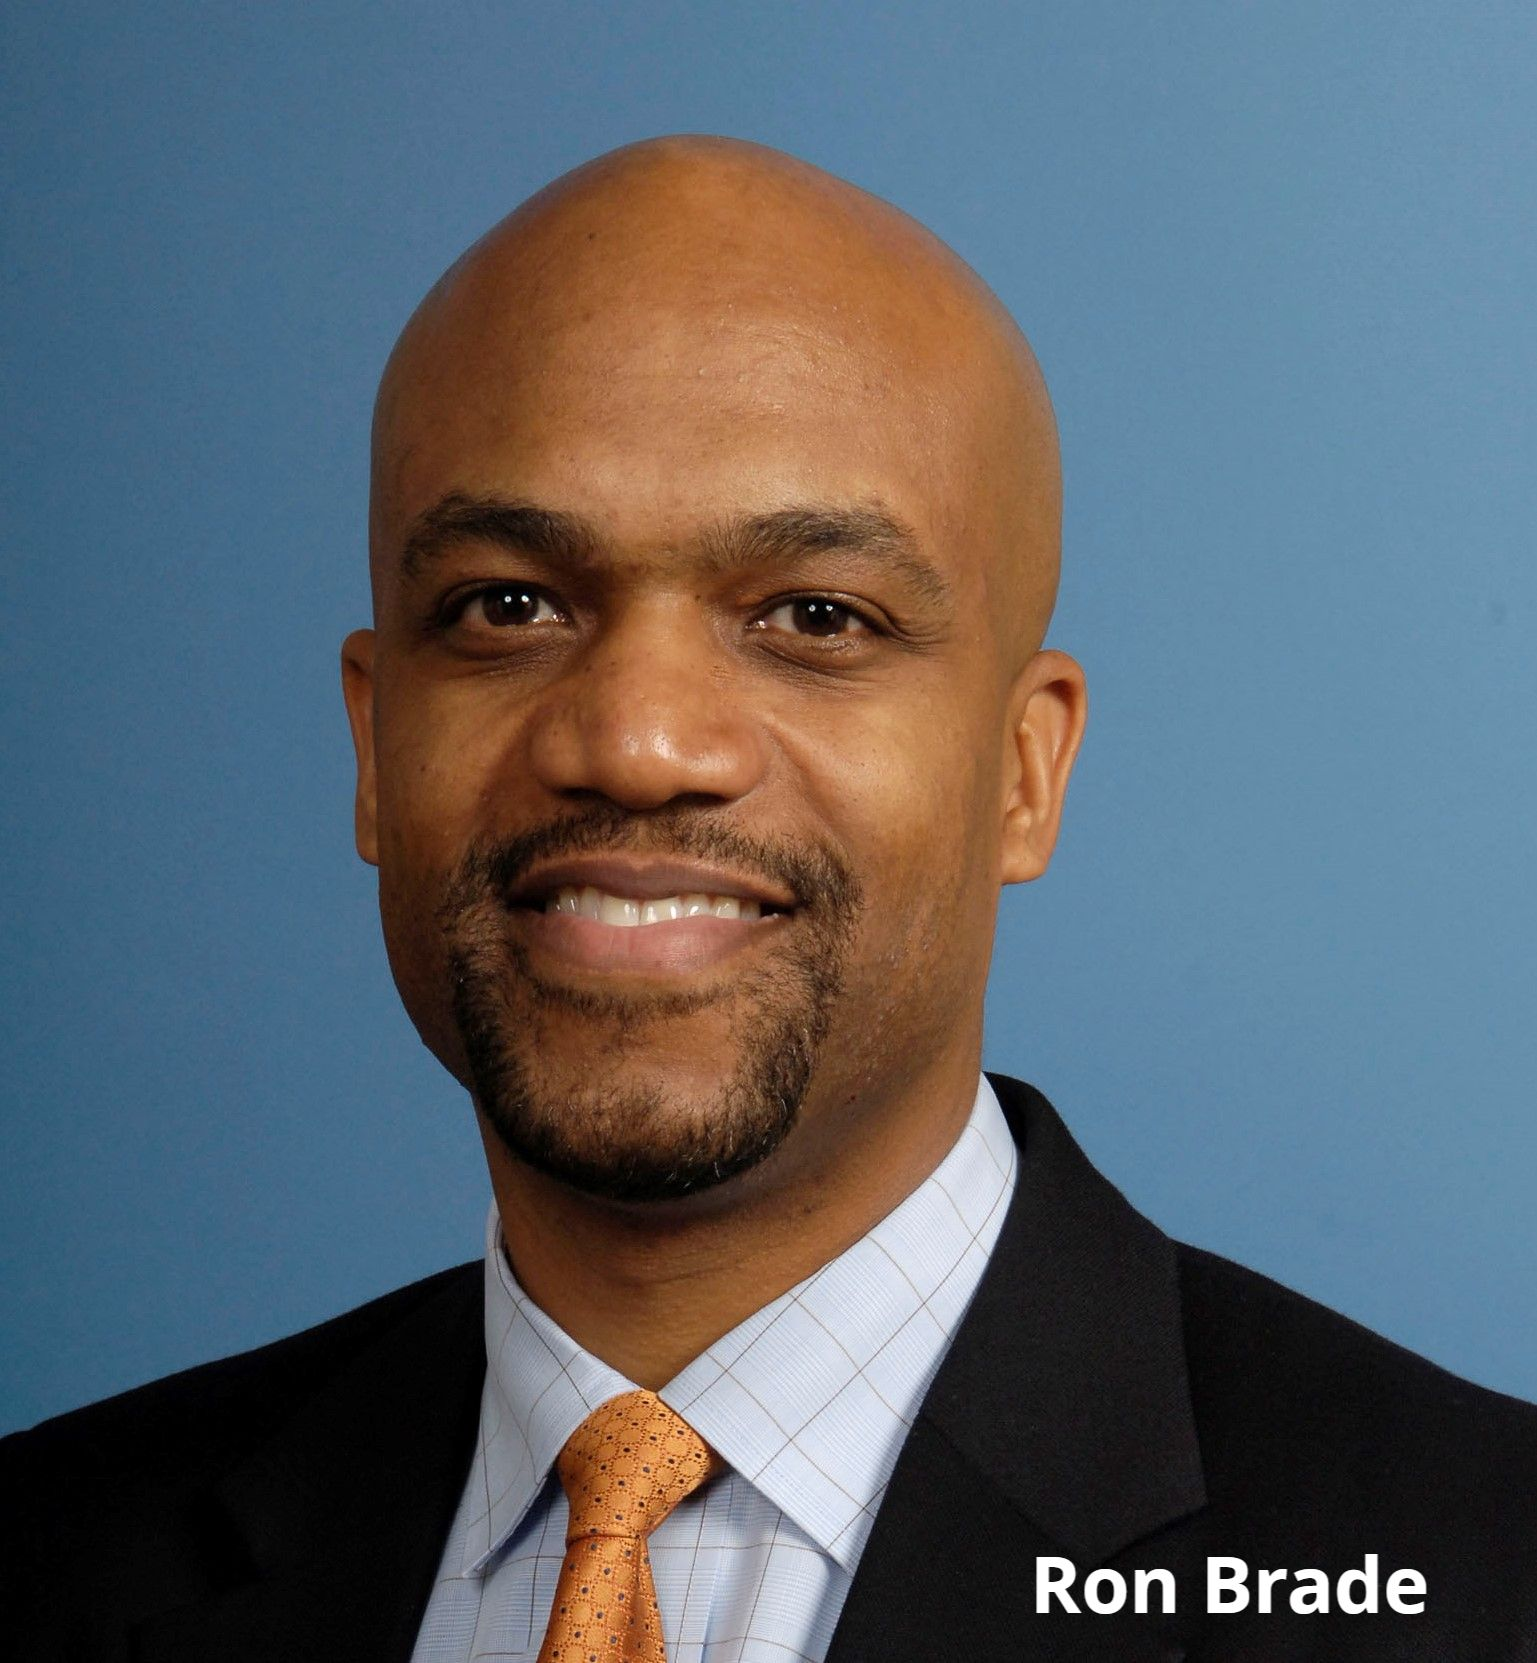 Ron Brade